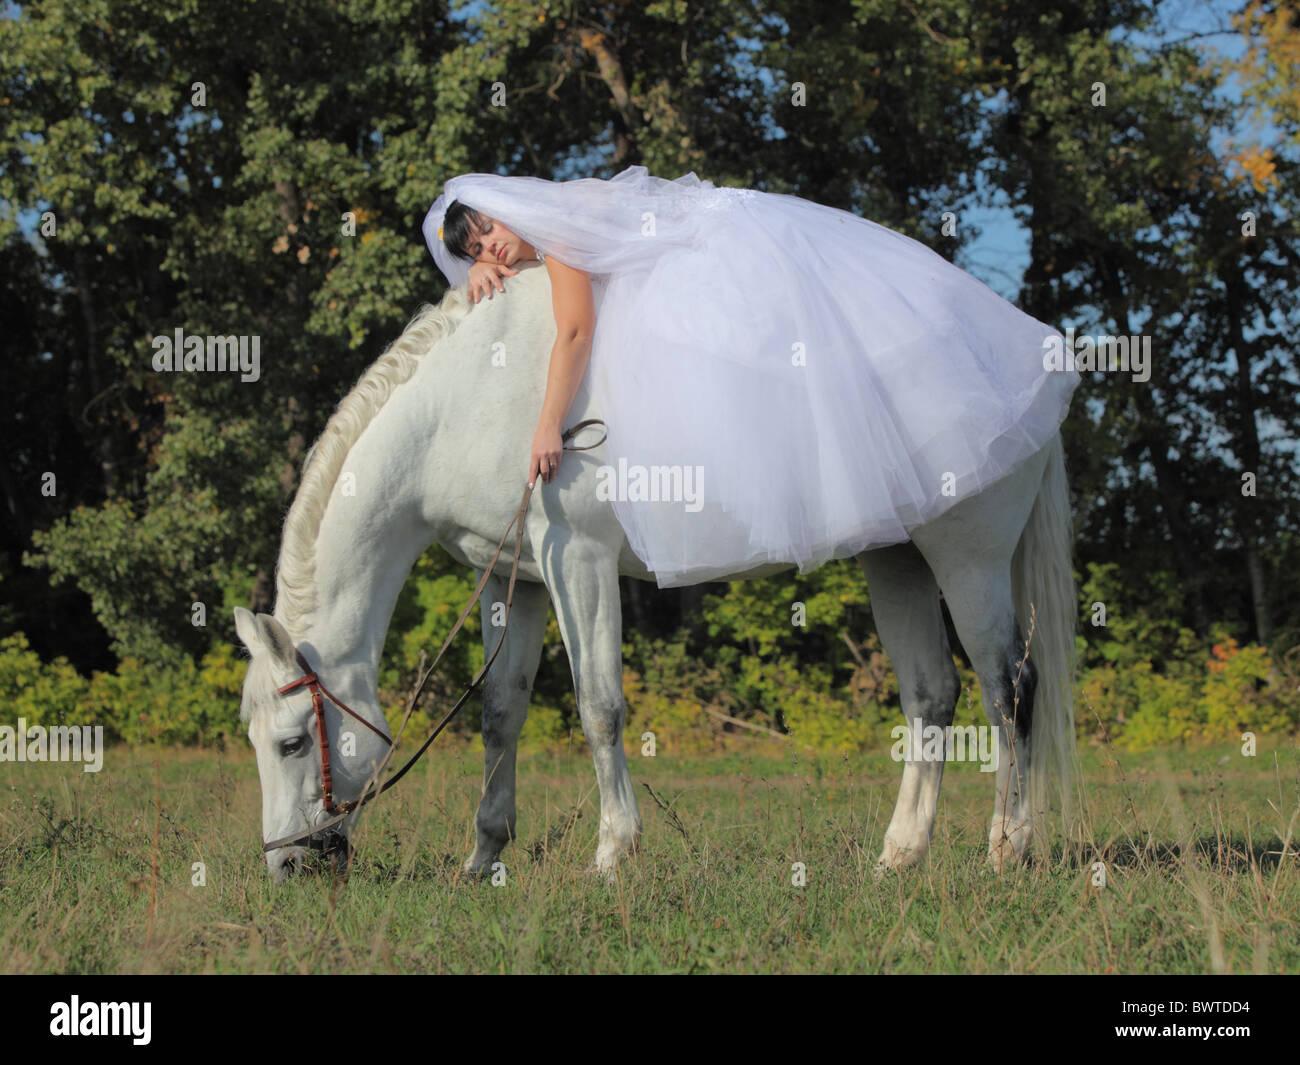 Horse in Wedding Dress